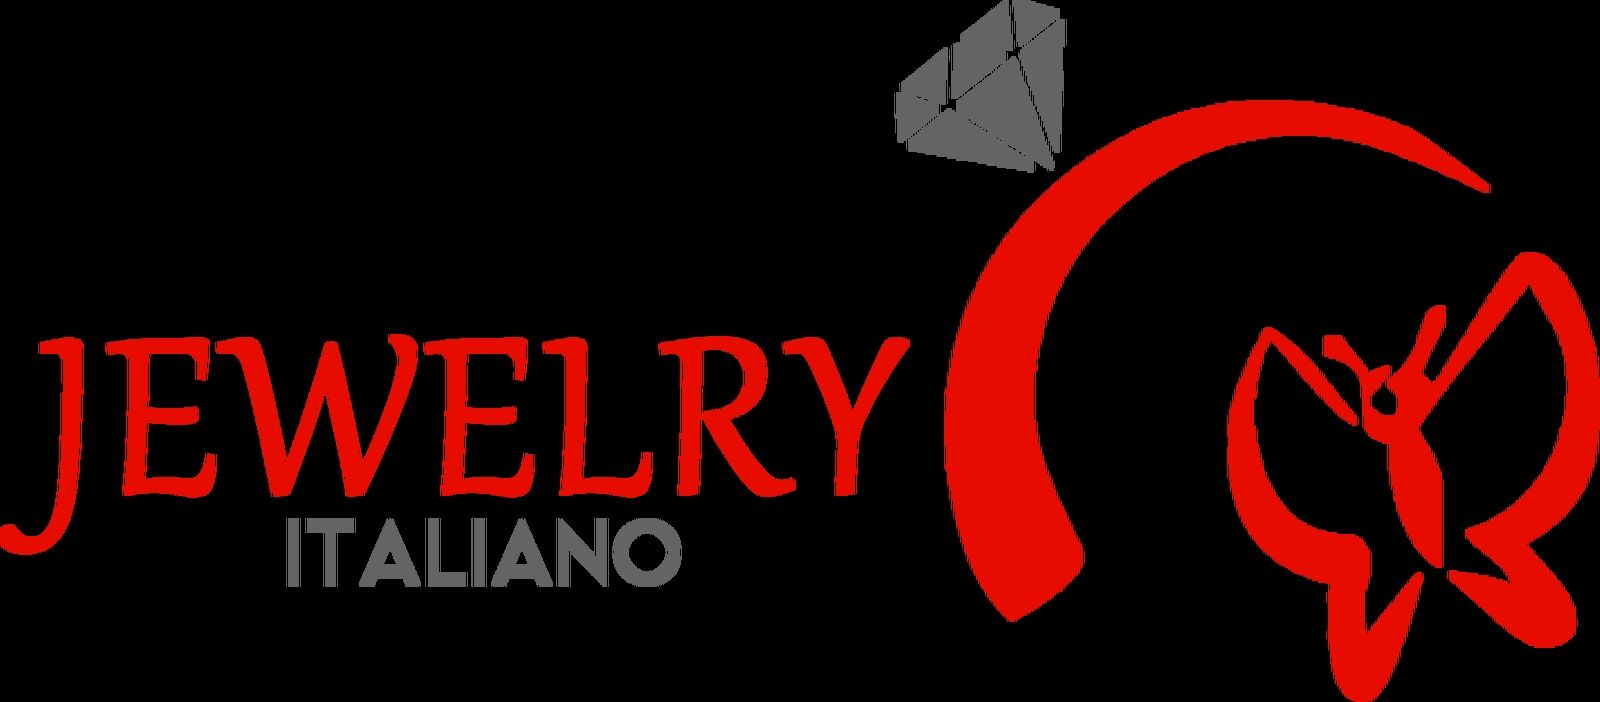 Jewelry Italiano